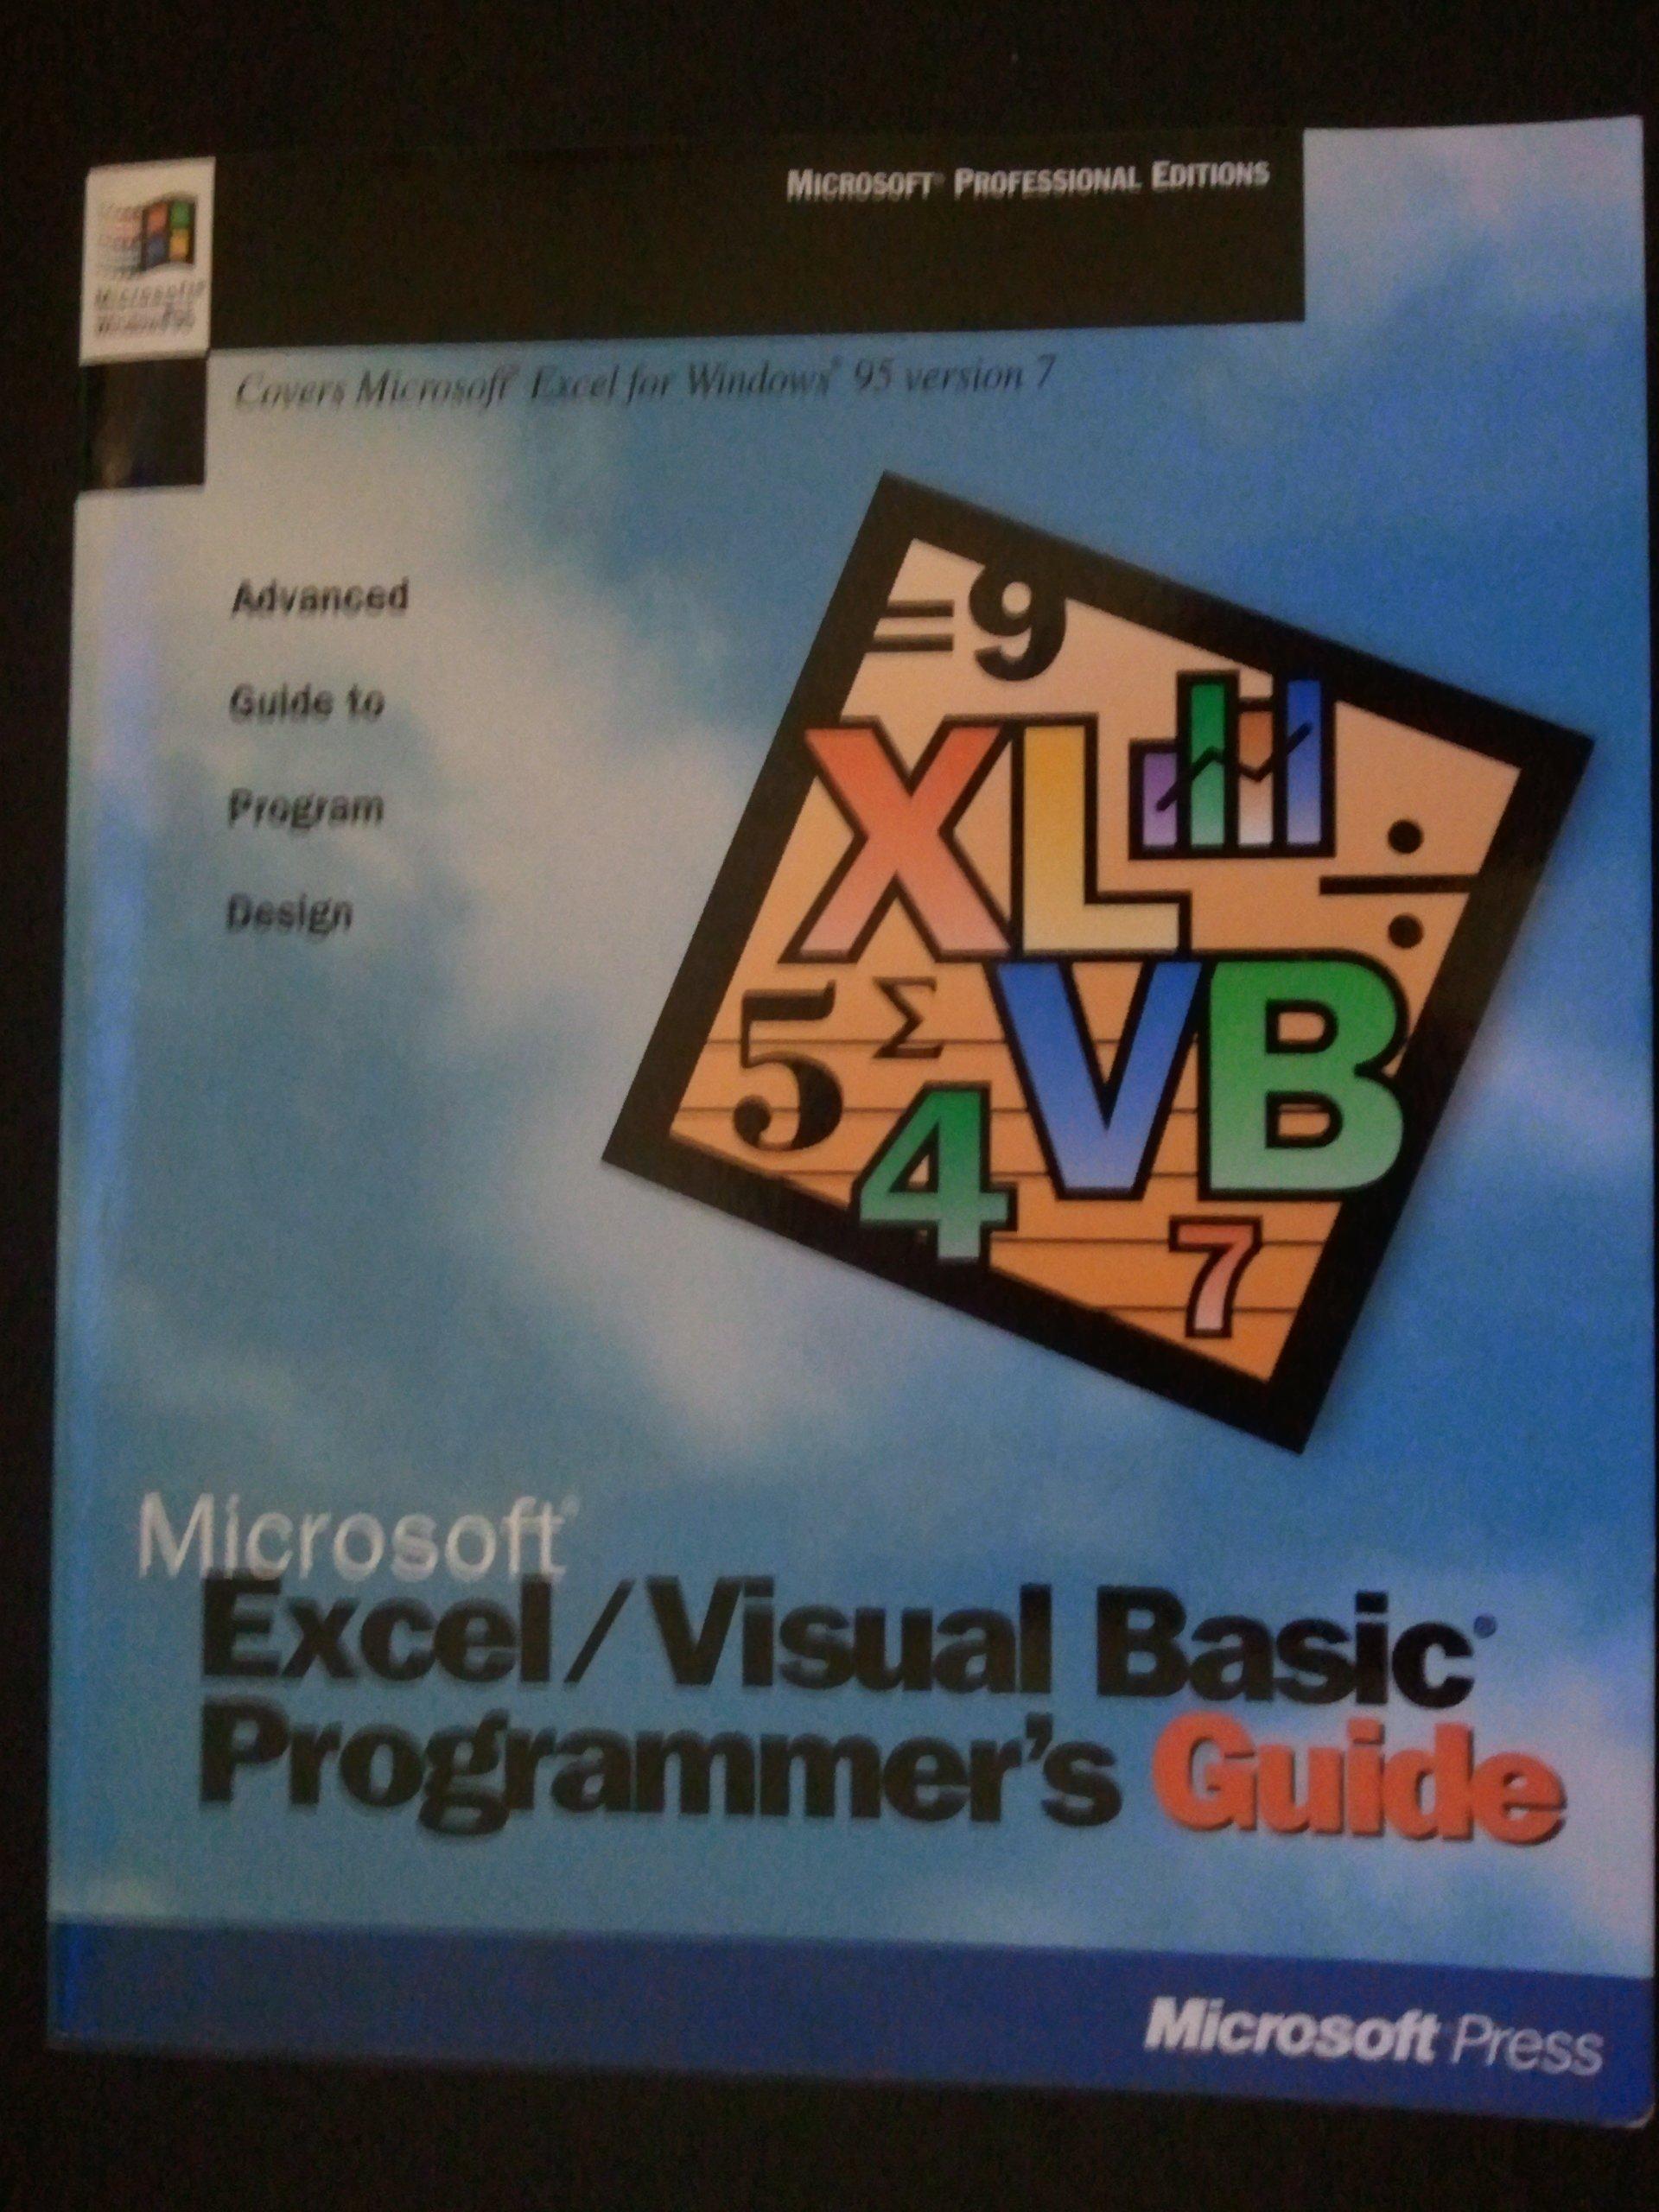 Microsoft Excel/Visual Basic Programmer's Guide: Advanced Guide to Program  Design (Microsoft Professional Editions): Microsoft Press: 9781556158193:  ...